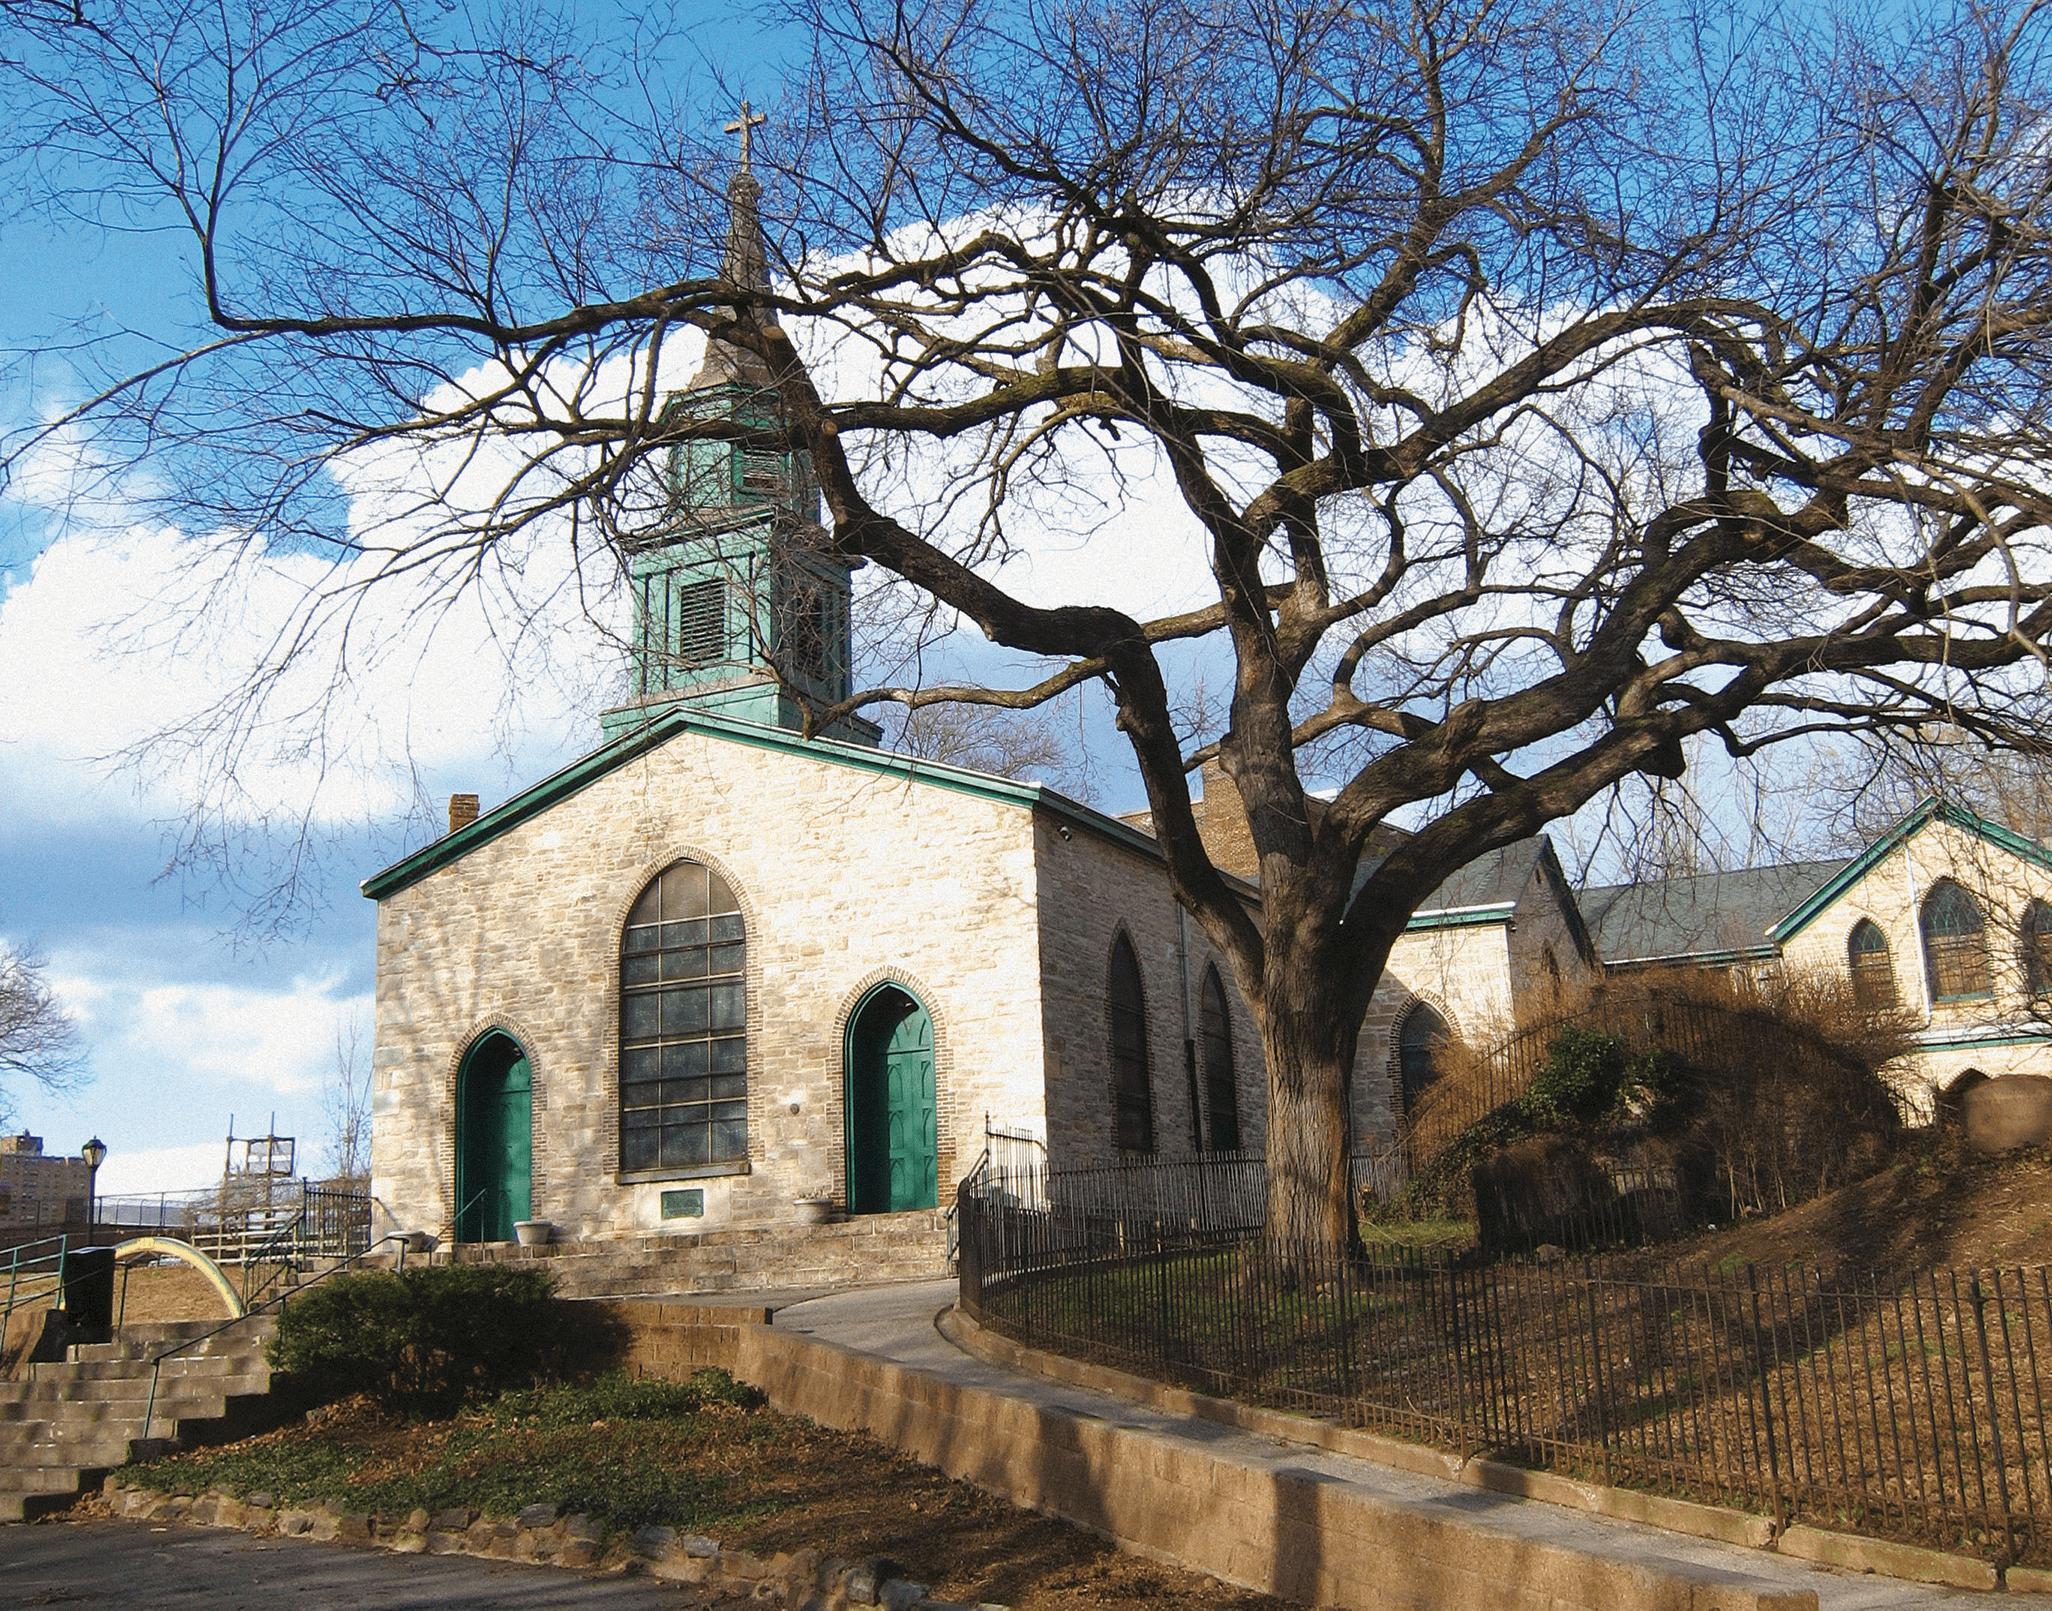 St.Ann's Church in Mott Haven Bronx